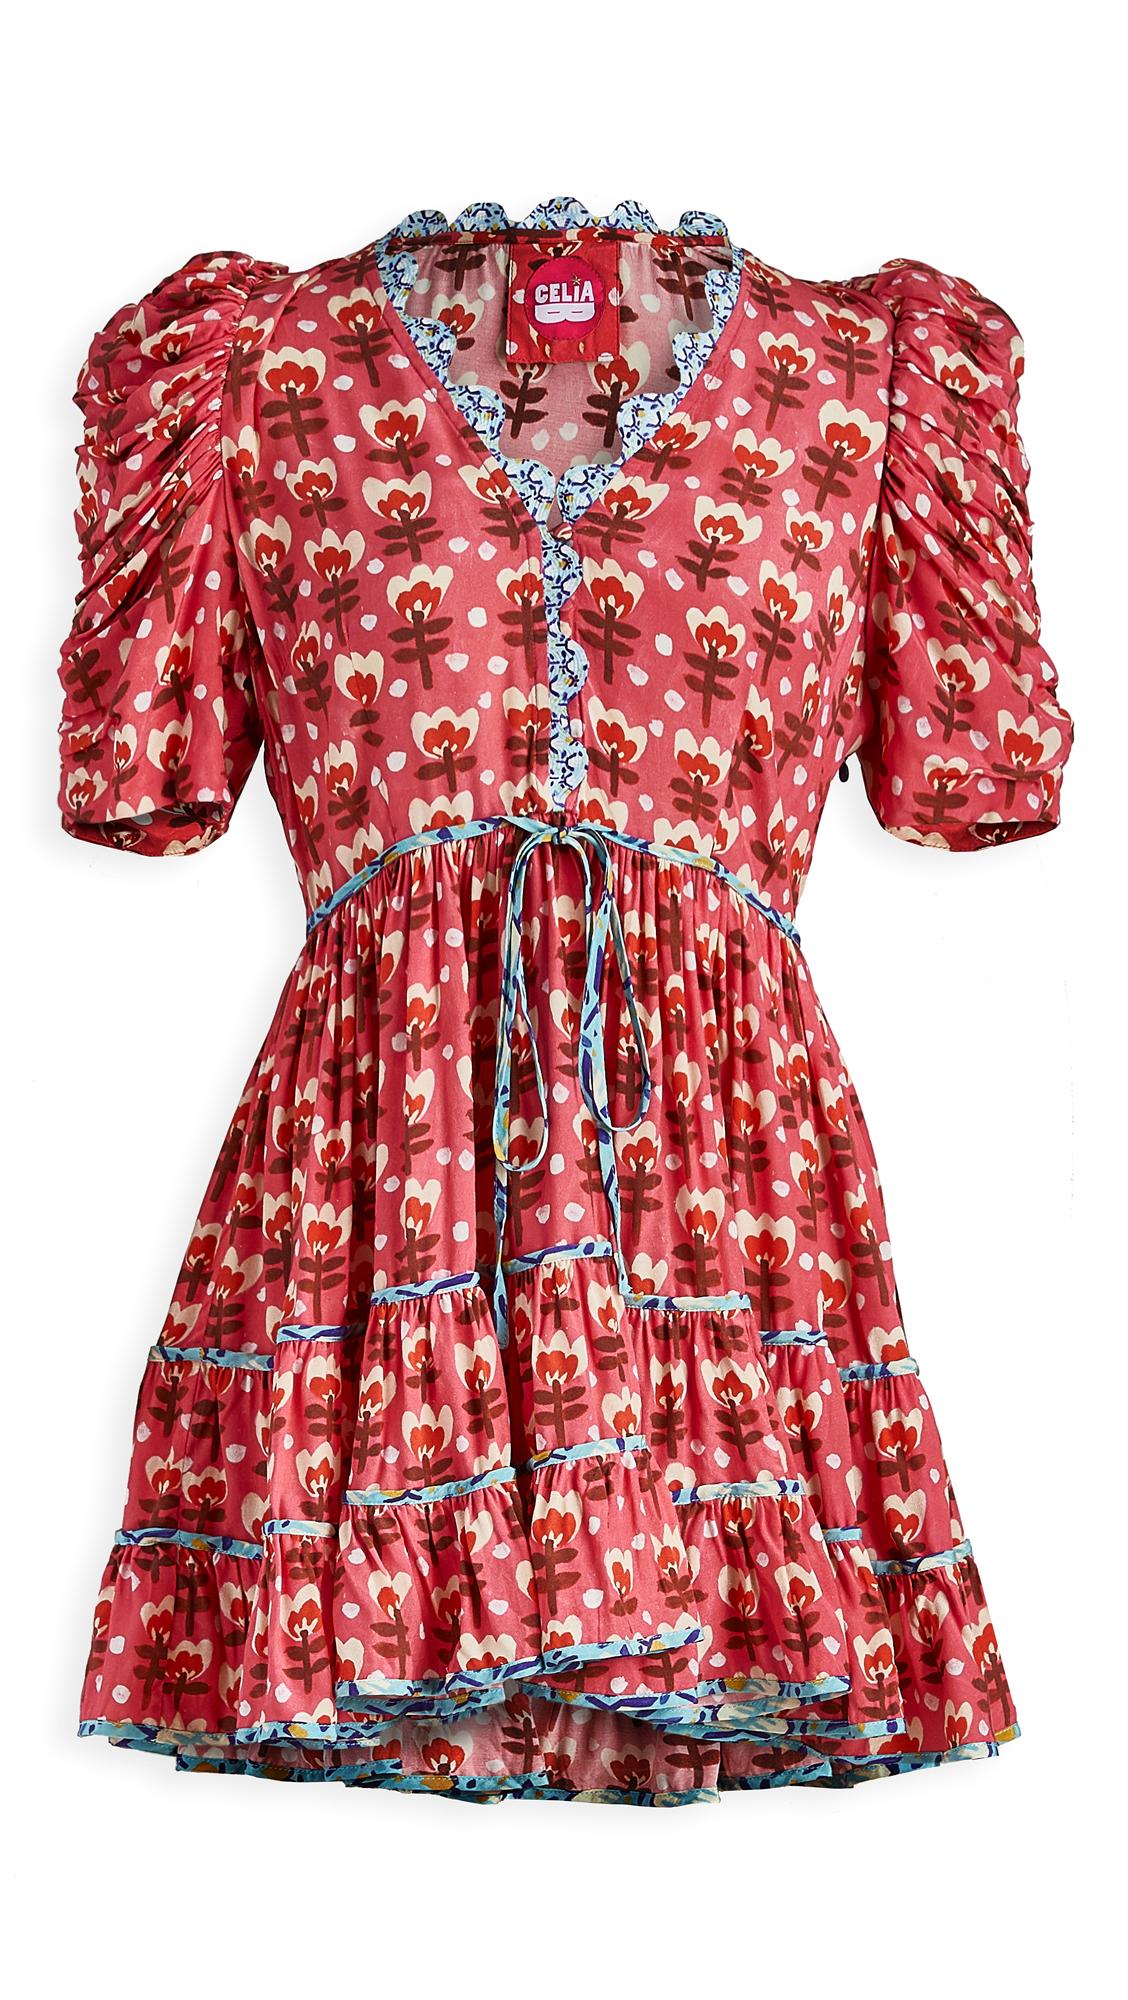 CeliaB Paradise Dress